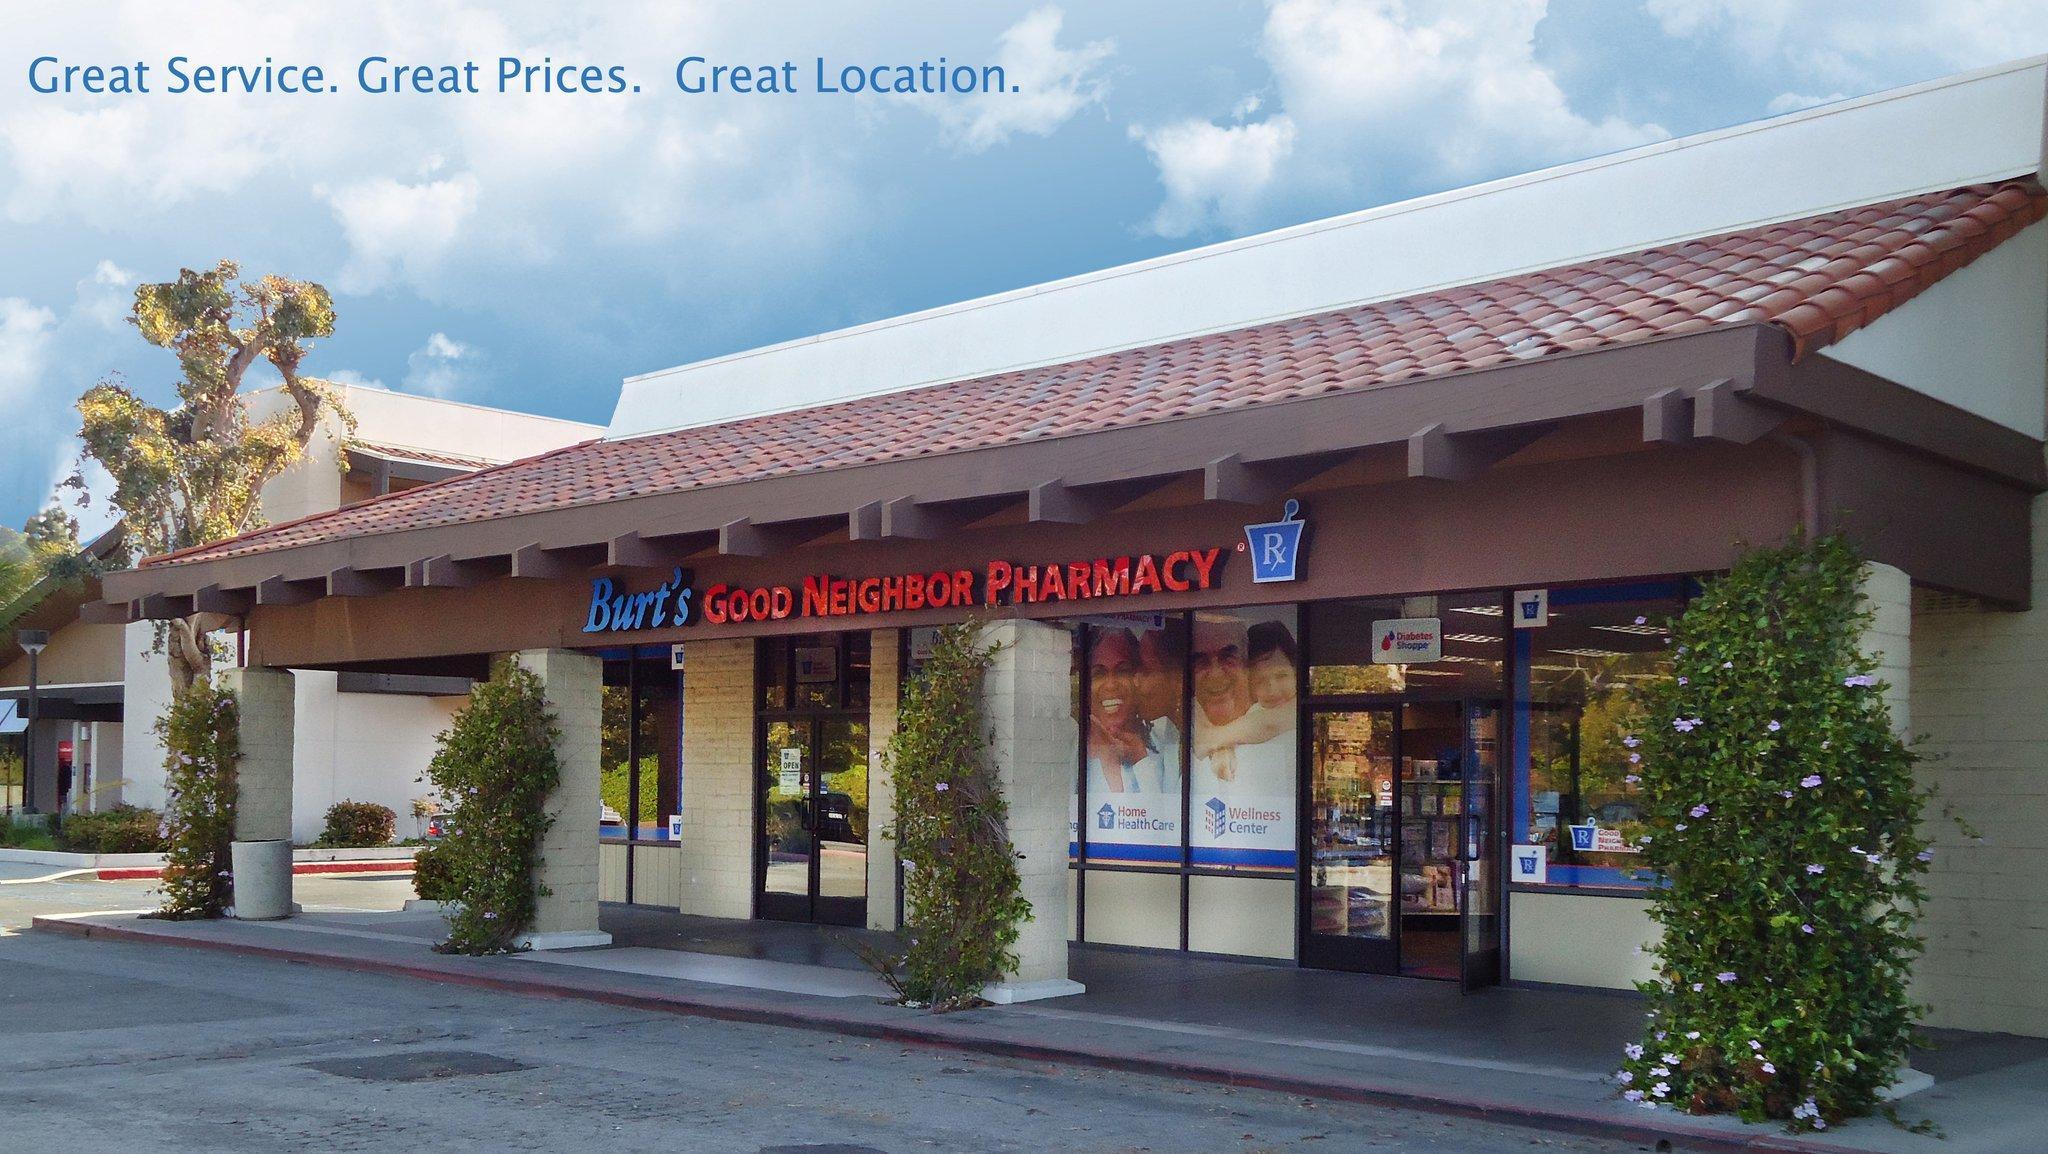 Compounding Pharmacy - Burt's Pharmacy image 0